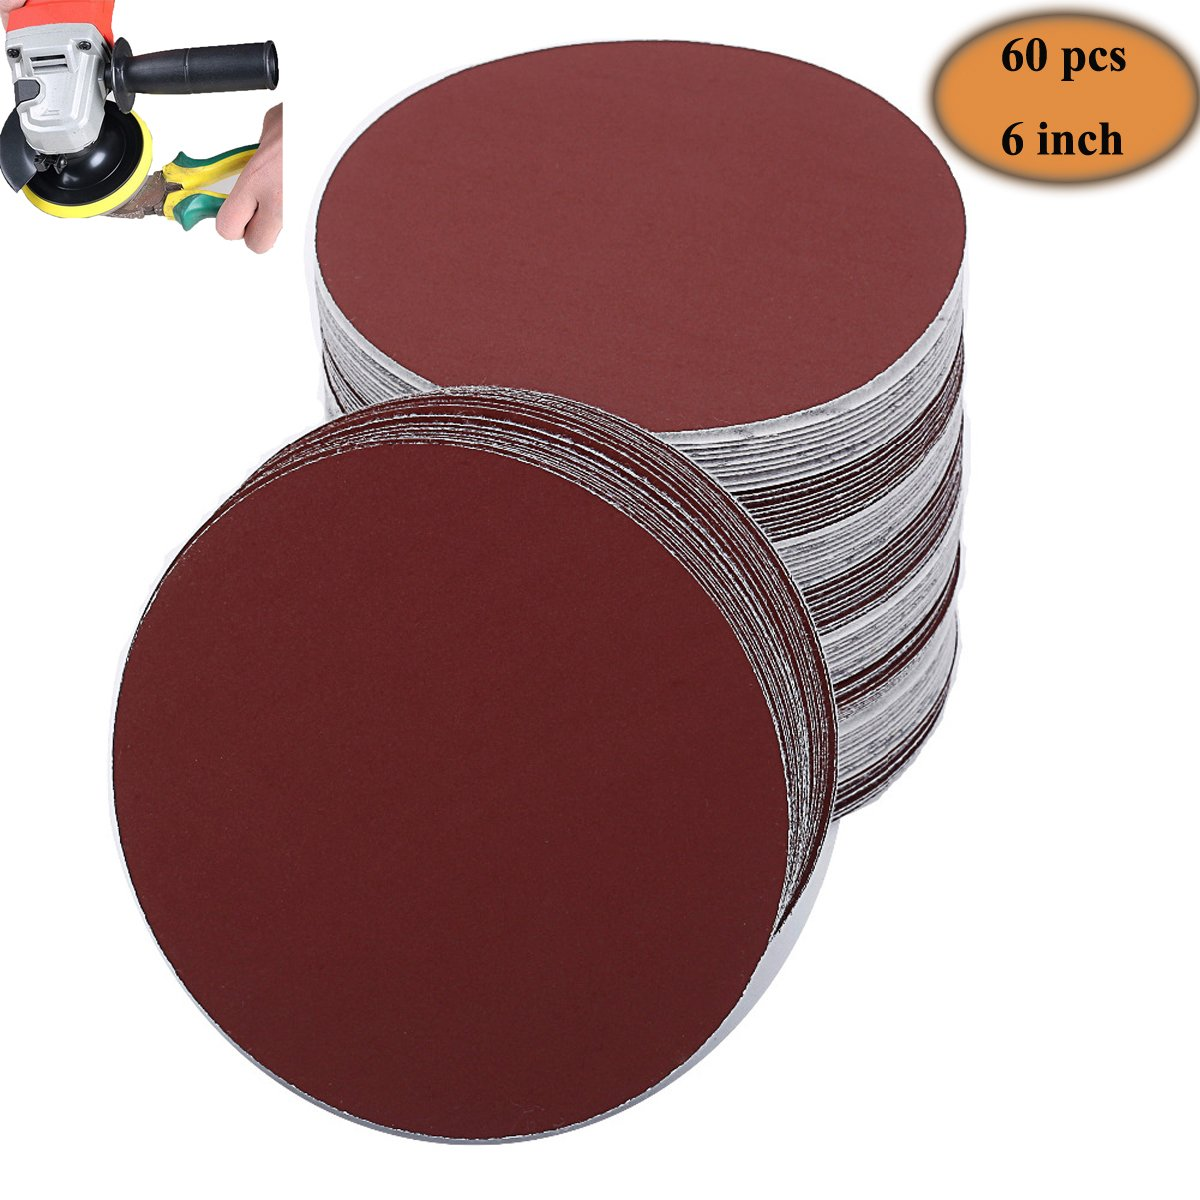 Home Swaver 60x 6'' PSA Aluminum Oxide Sanding Disc Self Adhesive 80/100/120/180/240/400 Grit Sandpaper 10 PCS for Each